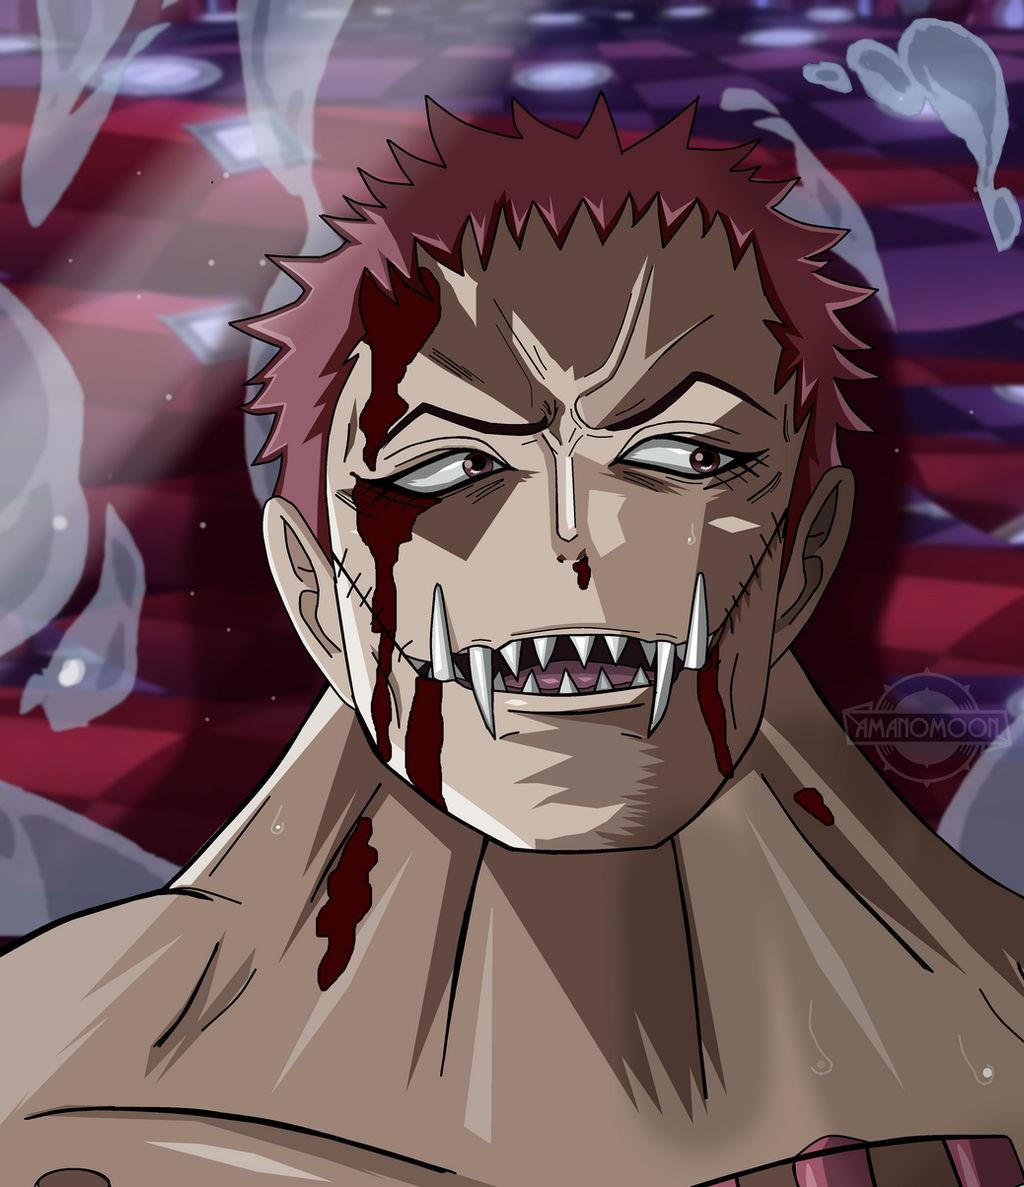 One Piece Chapter 902 Katakuri Smile Colors Anime by Amanomoon on DeviantArt